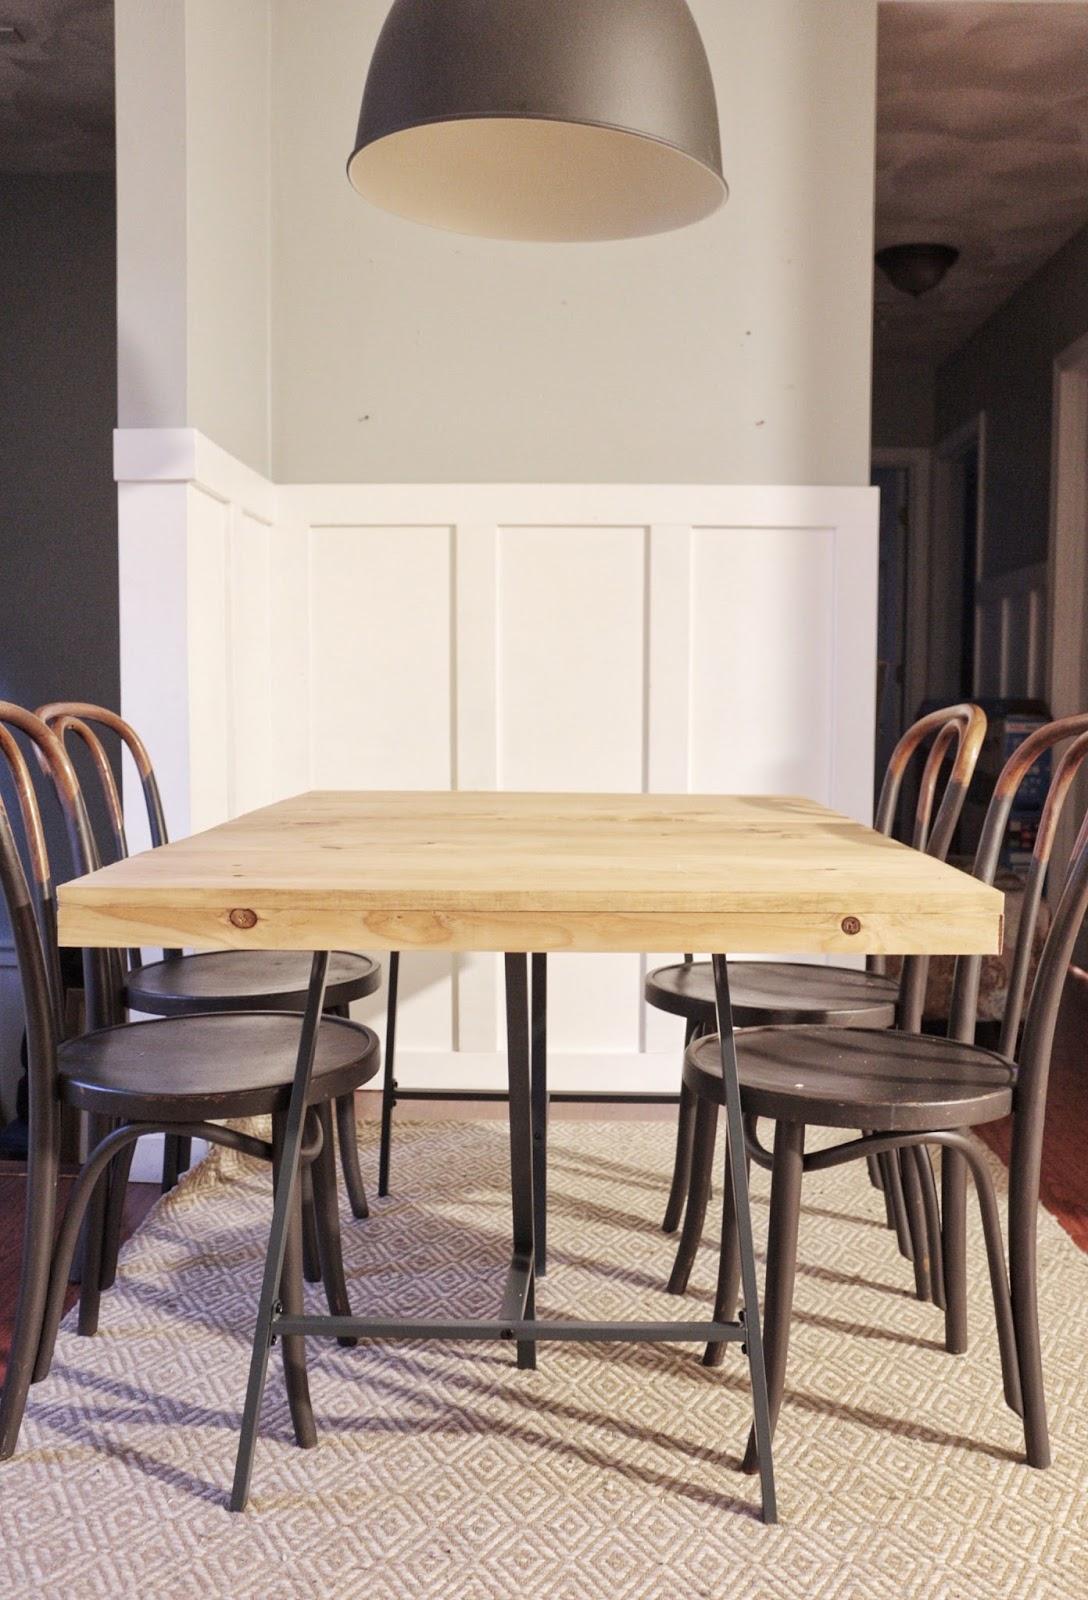 Diy Dining Table Ikea Lerberg Made By Carli